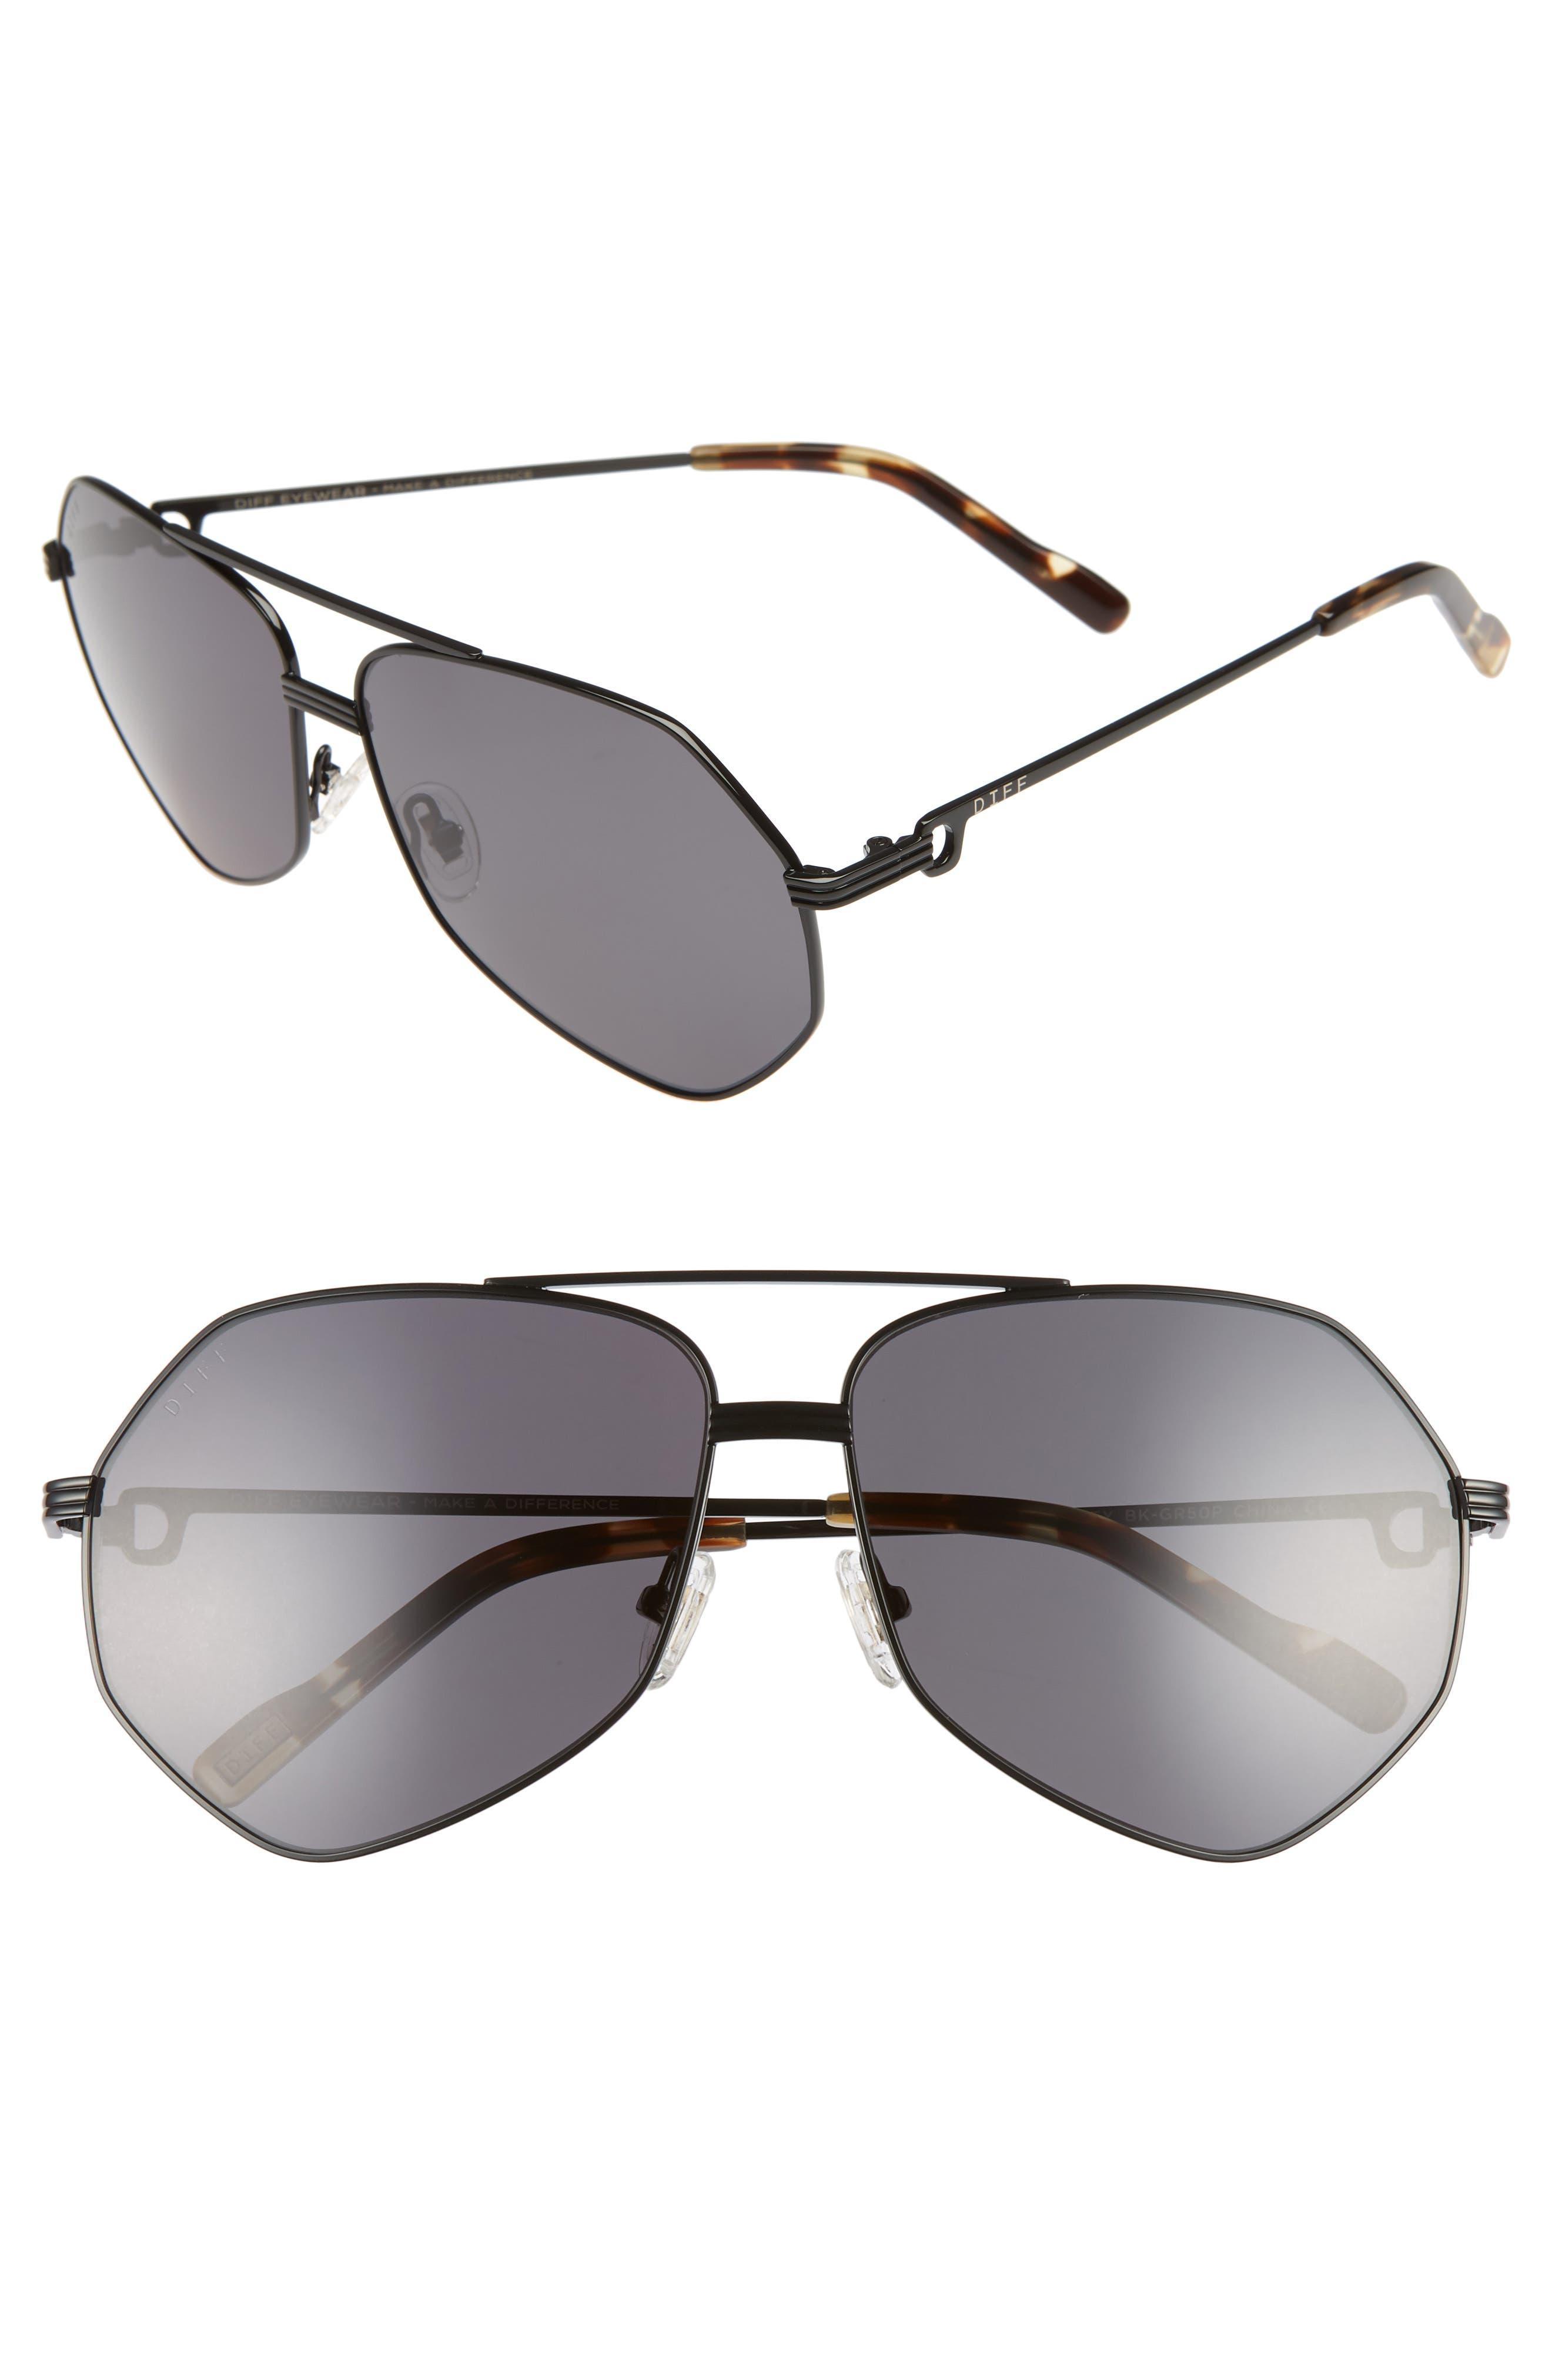 Sydney 62mm Polarized Aviator Sunglasses,                         Main,                         color, BLACK/ MOSS HAVANA/ GREY